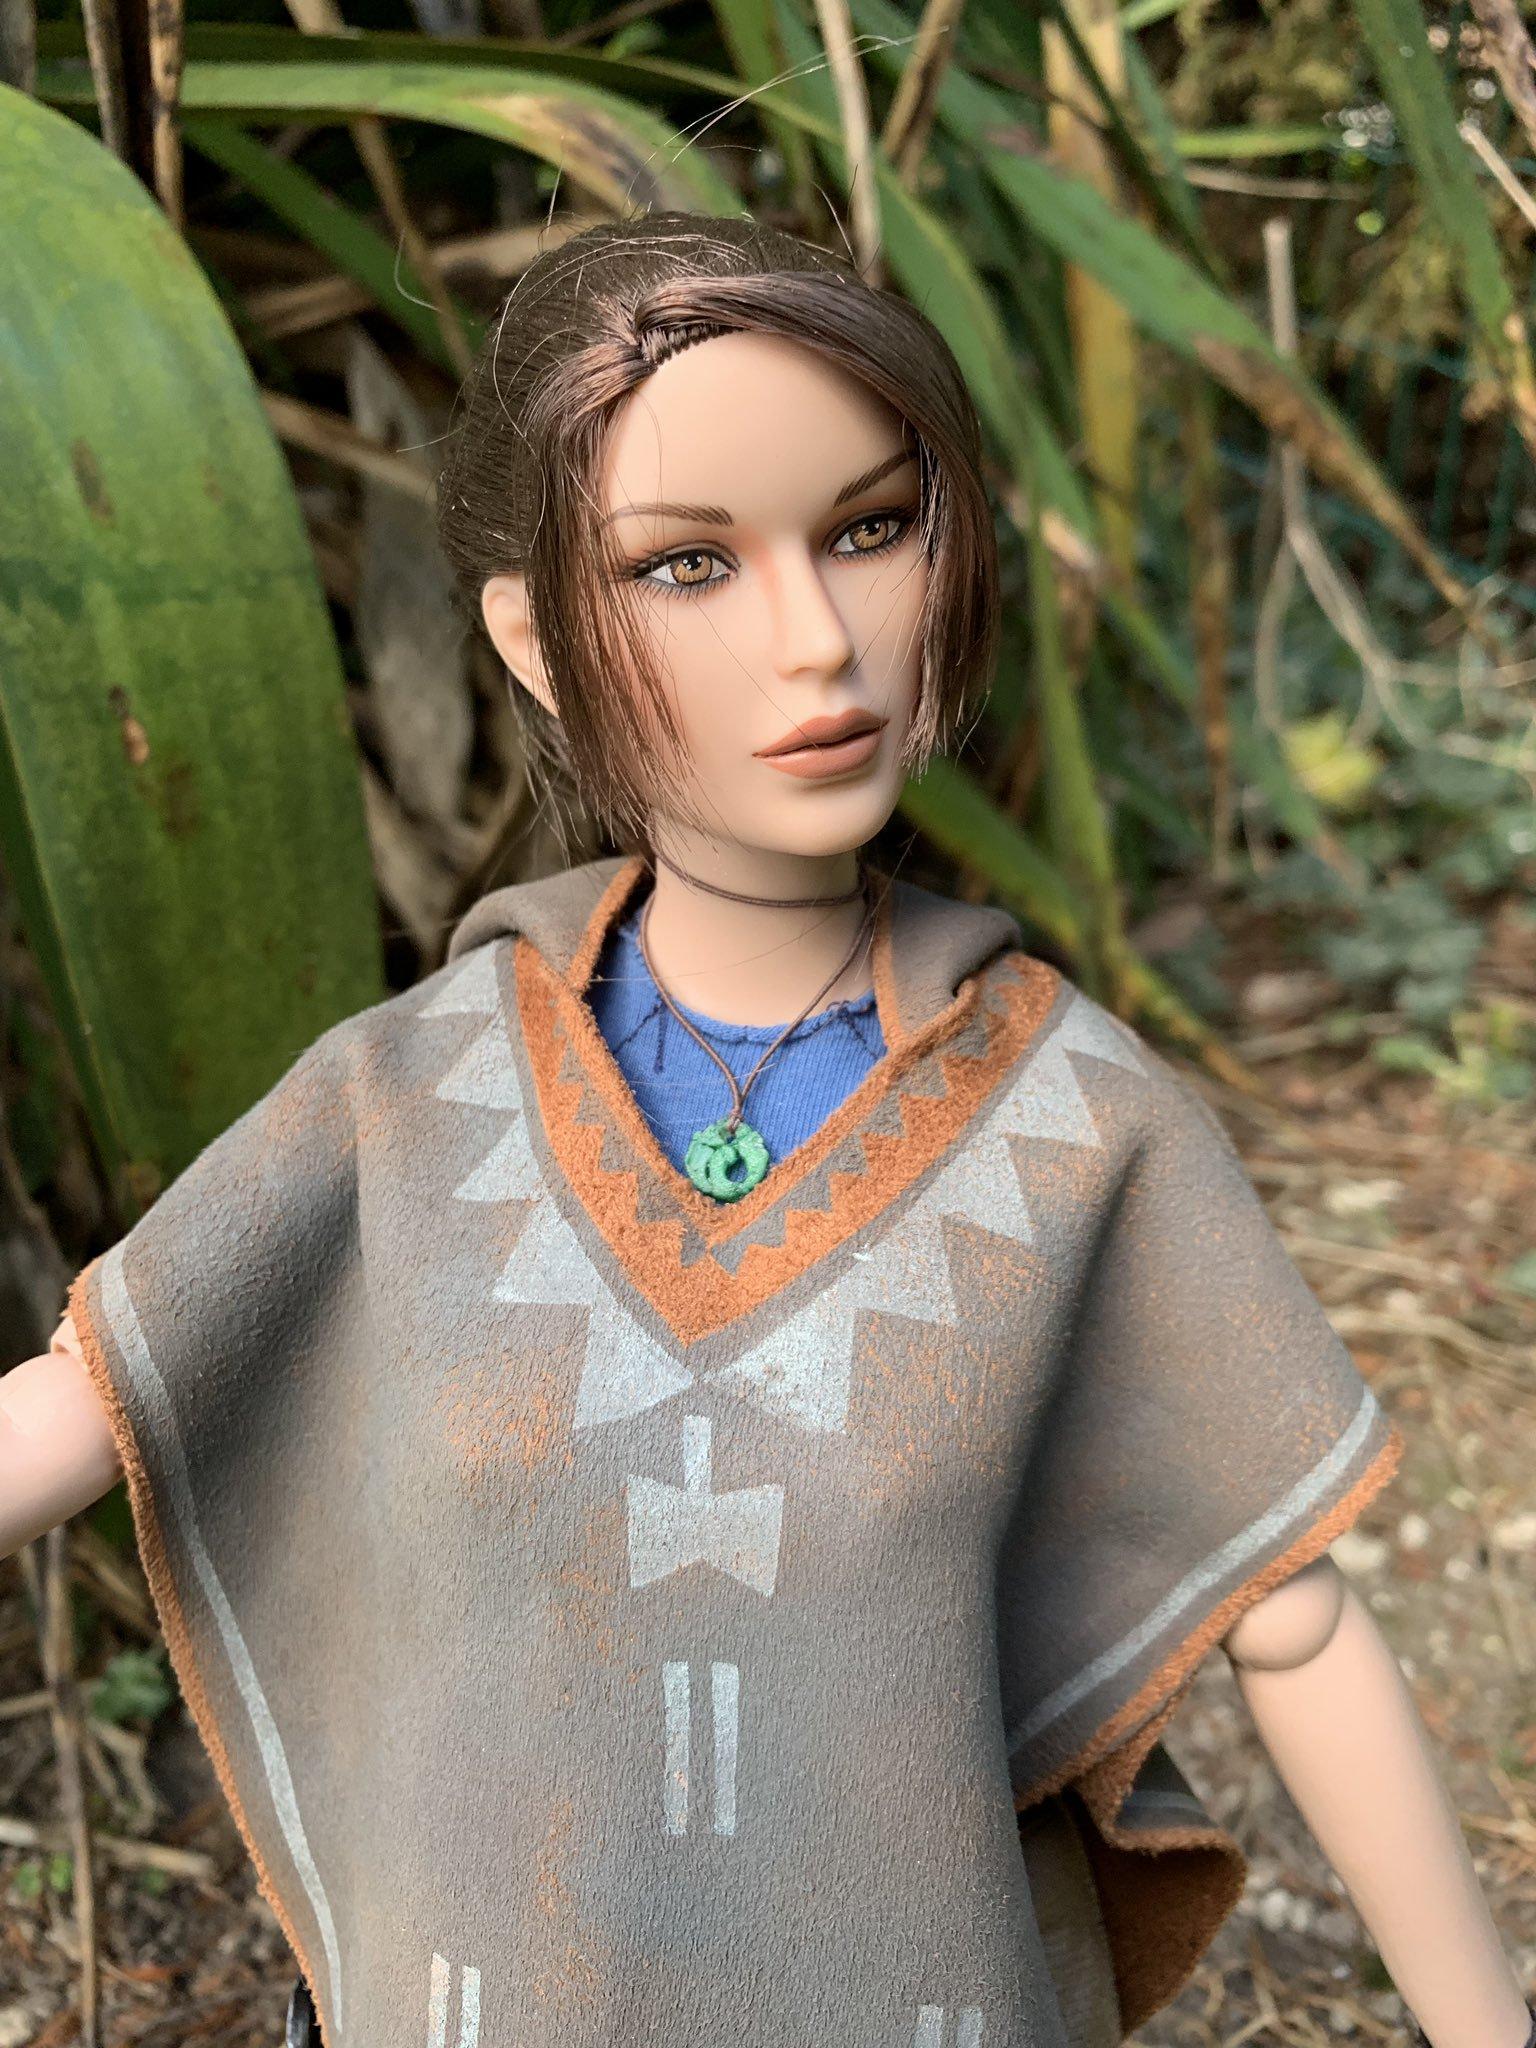 christophe-croft-lara-croft-tonner-doll-08